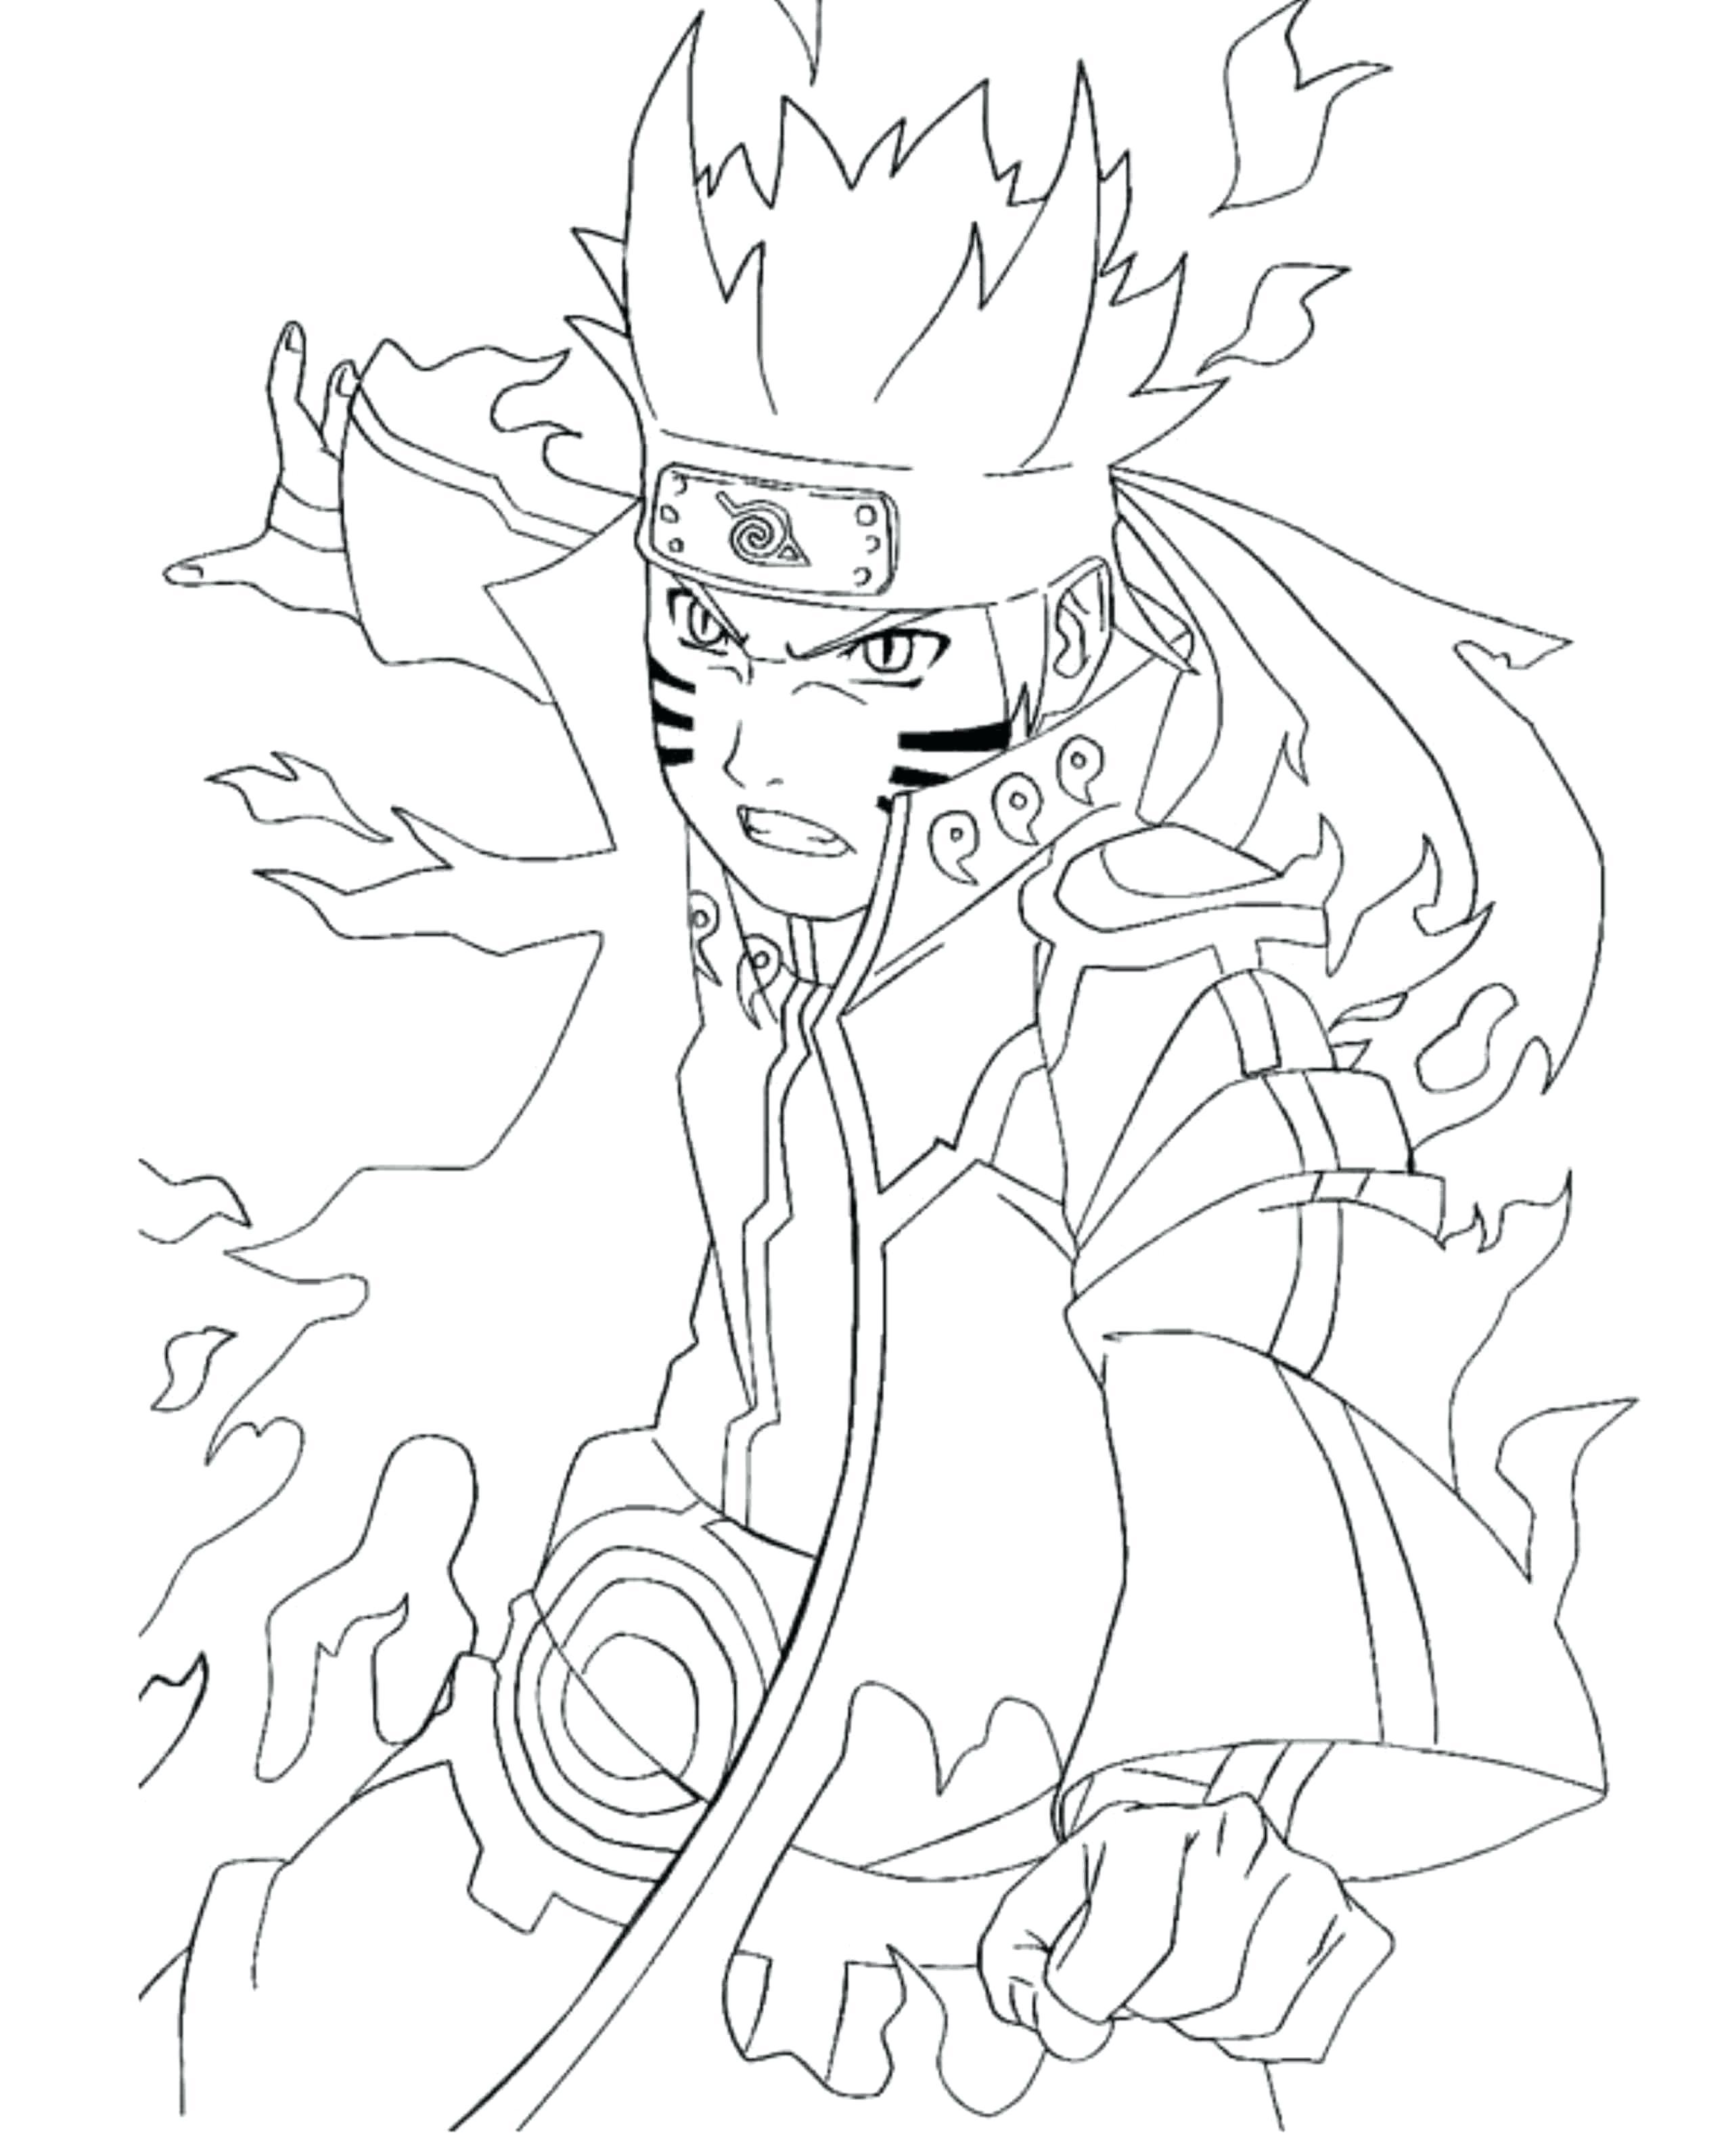 Naruto Vs Sasuke Drawing at GetDrawingscom Free for personal use